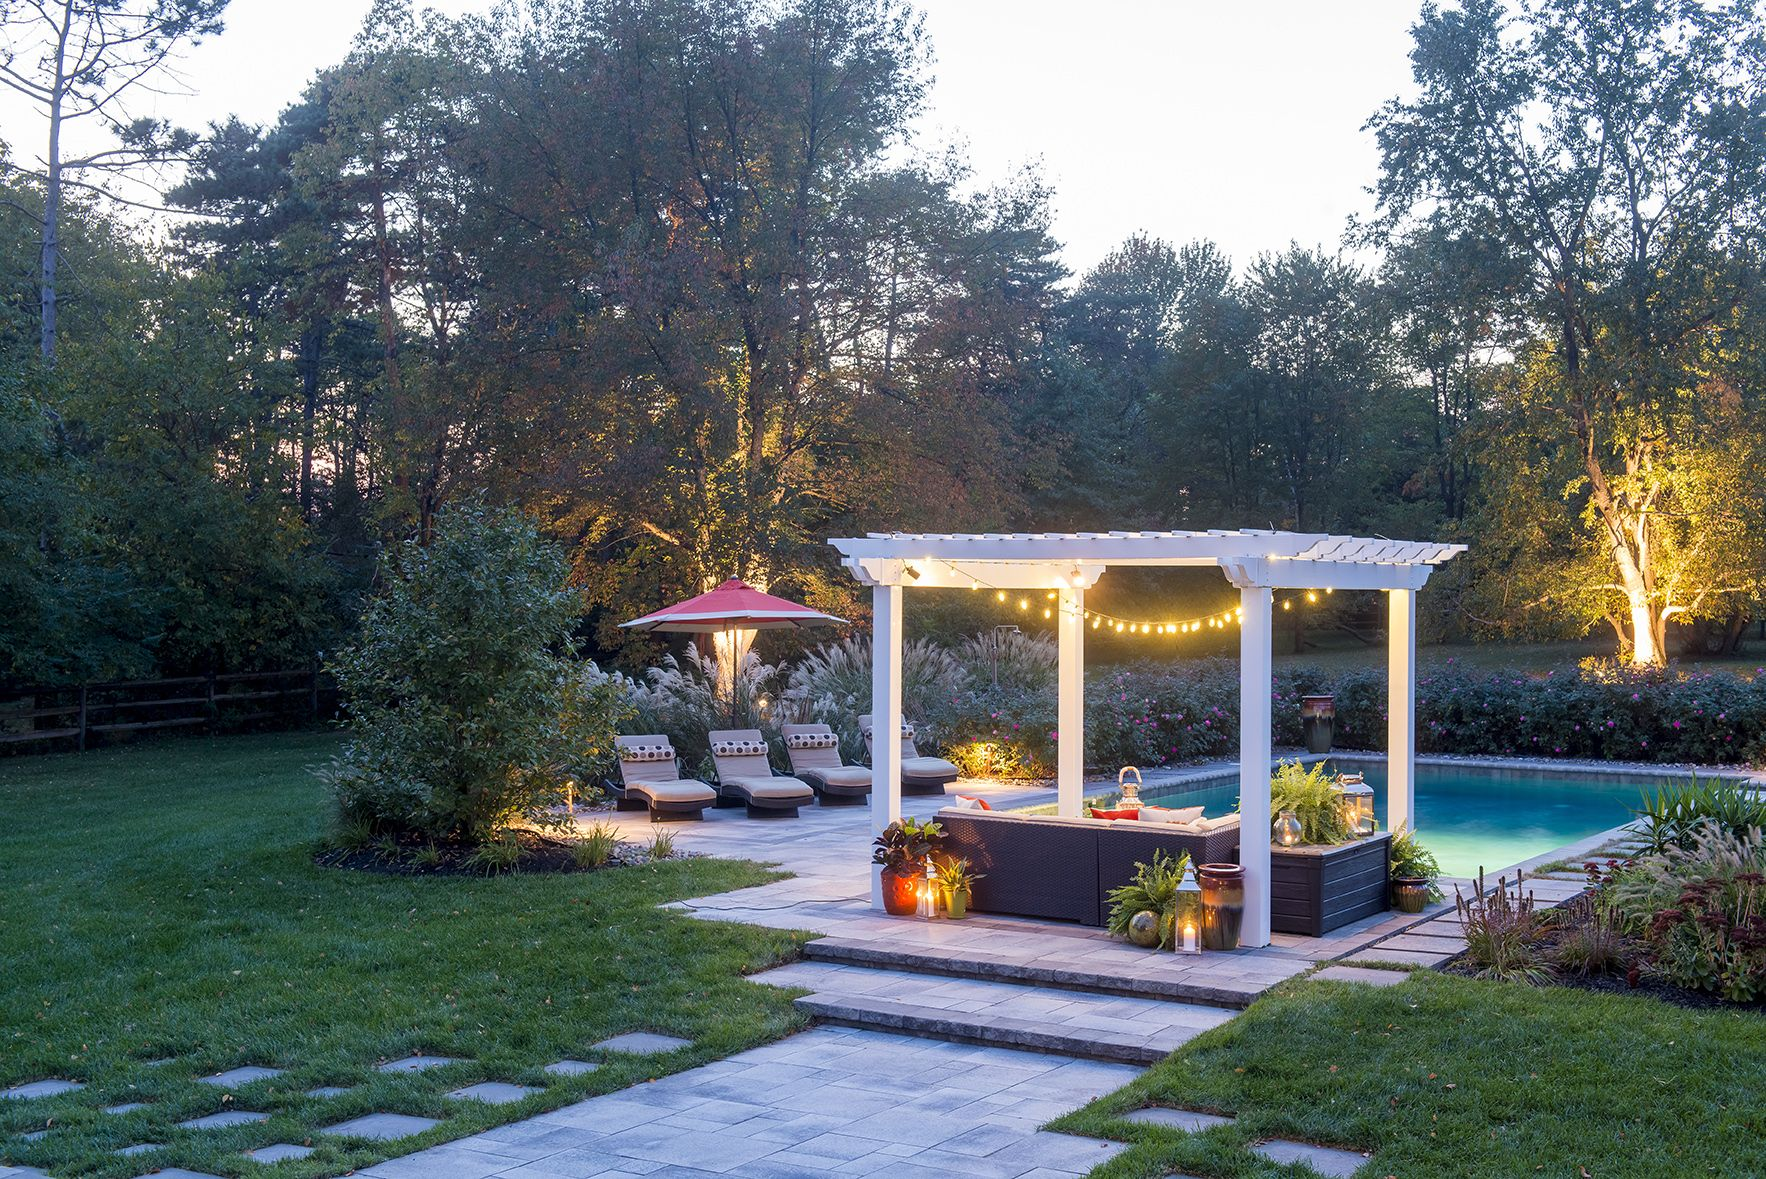 Superior Patio, Pergola And Pool Design For Evening Entertaining   Built By Gasper